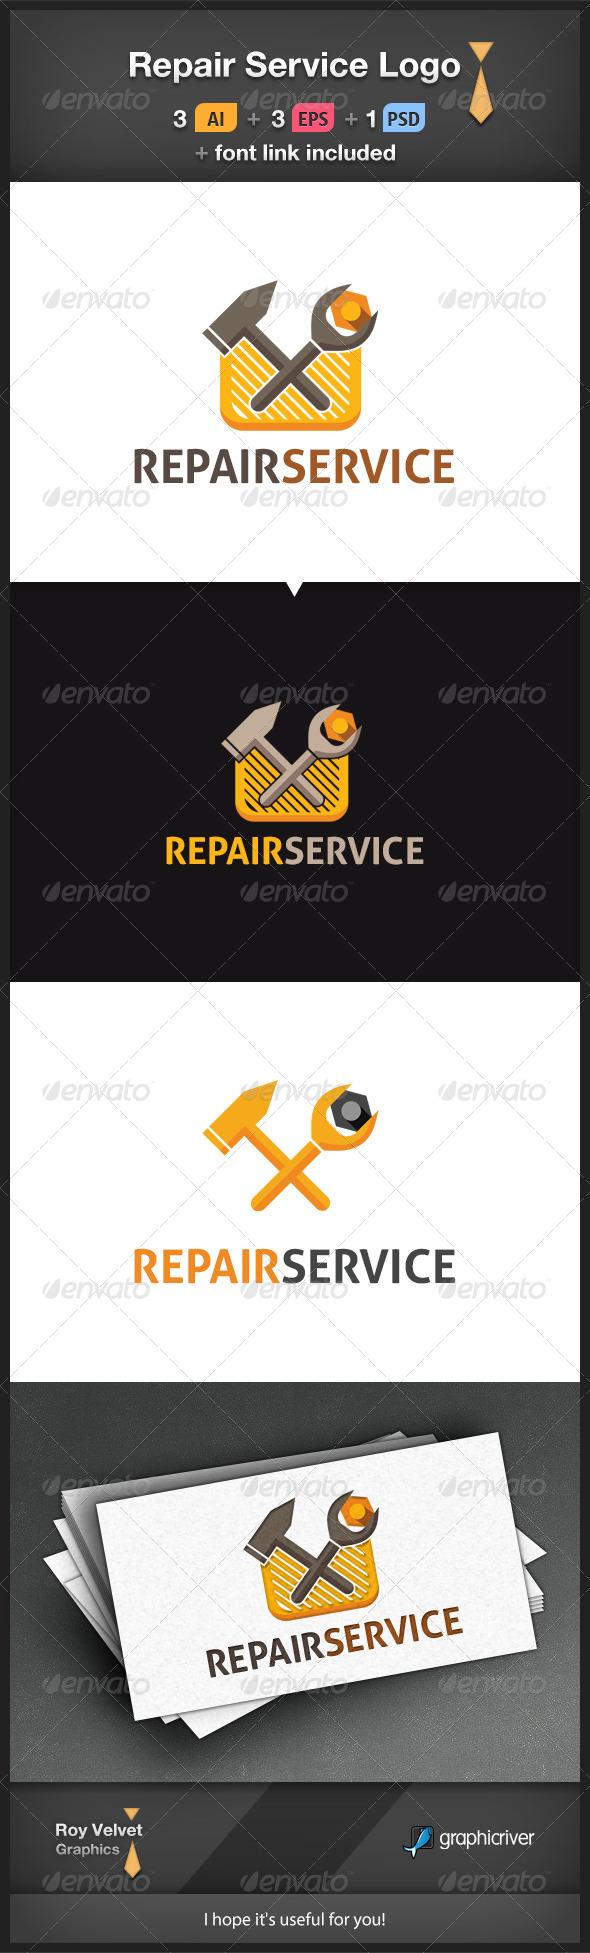 GraphicRiver Repair Service Logo 6366324